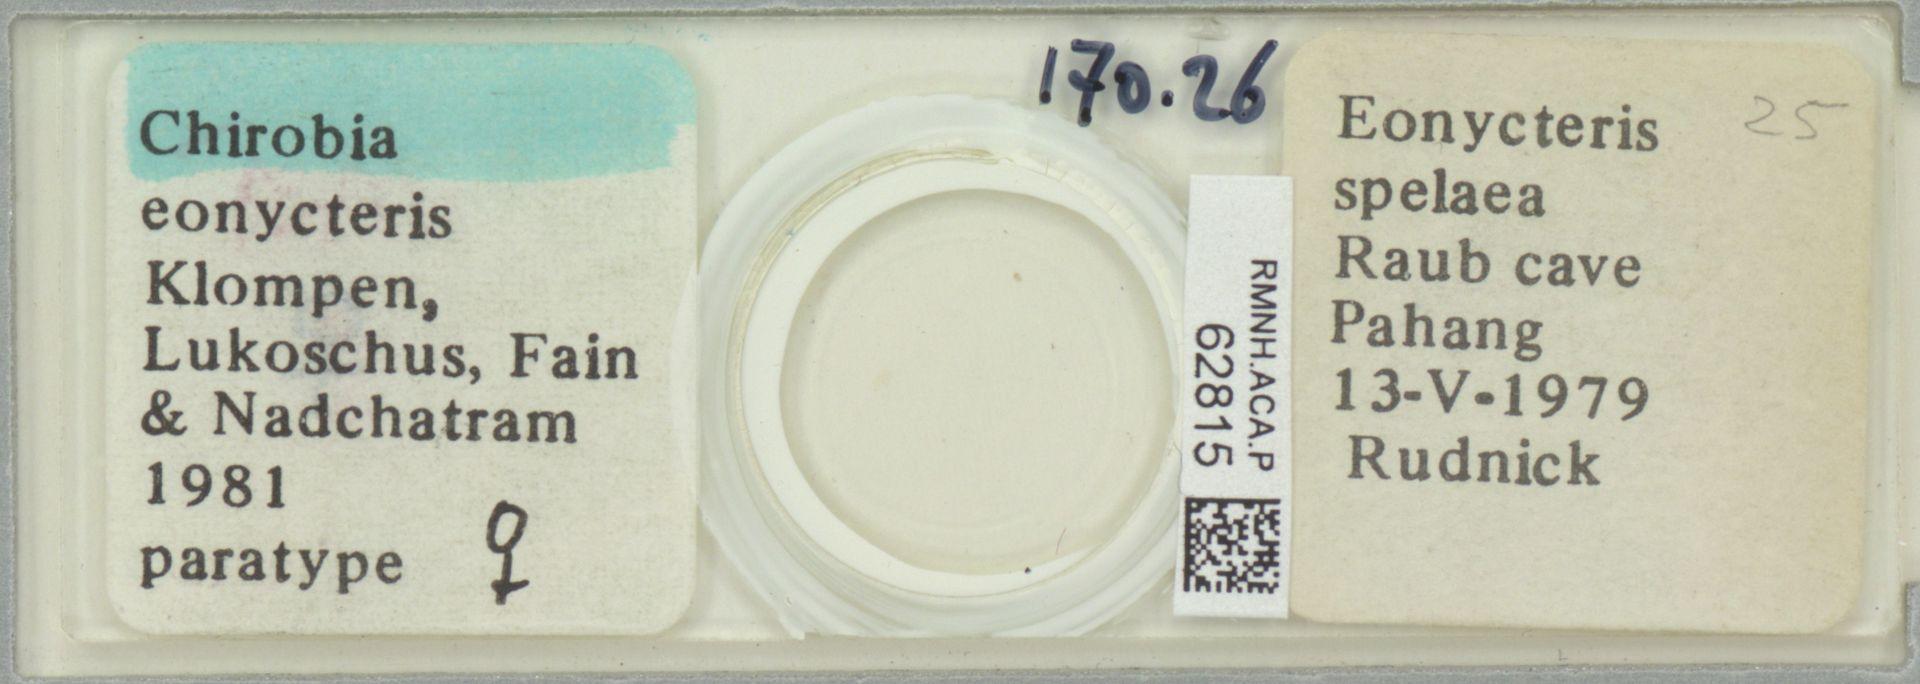 RMNH.ACA.P.62815   Chirobia eonycteris Klompen, Lukoschus, Fain & Nadchatram, 1981